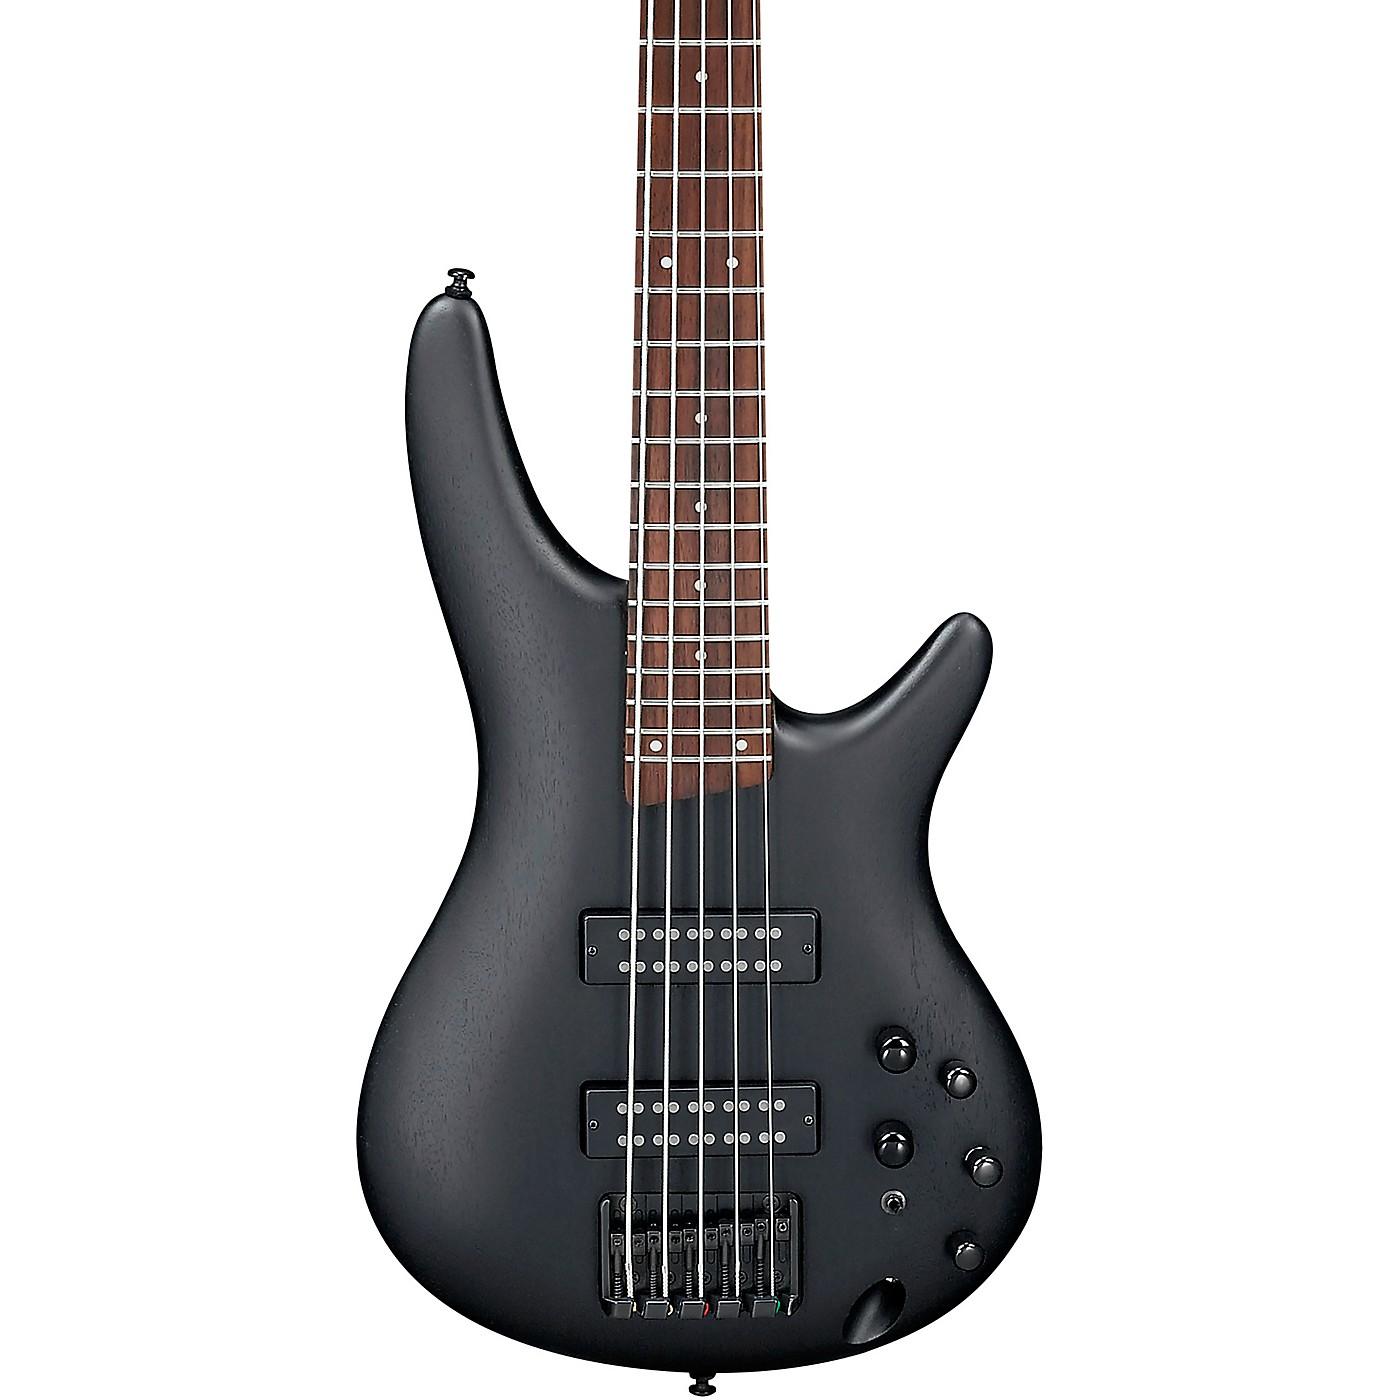 Ibanez SR305EB 5-String Electric Bass Guitar thumbnail